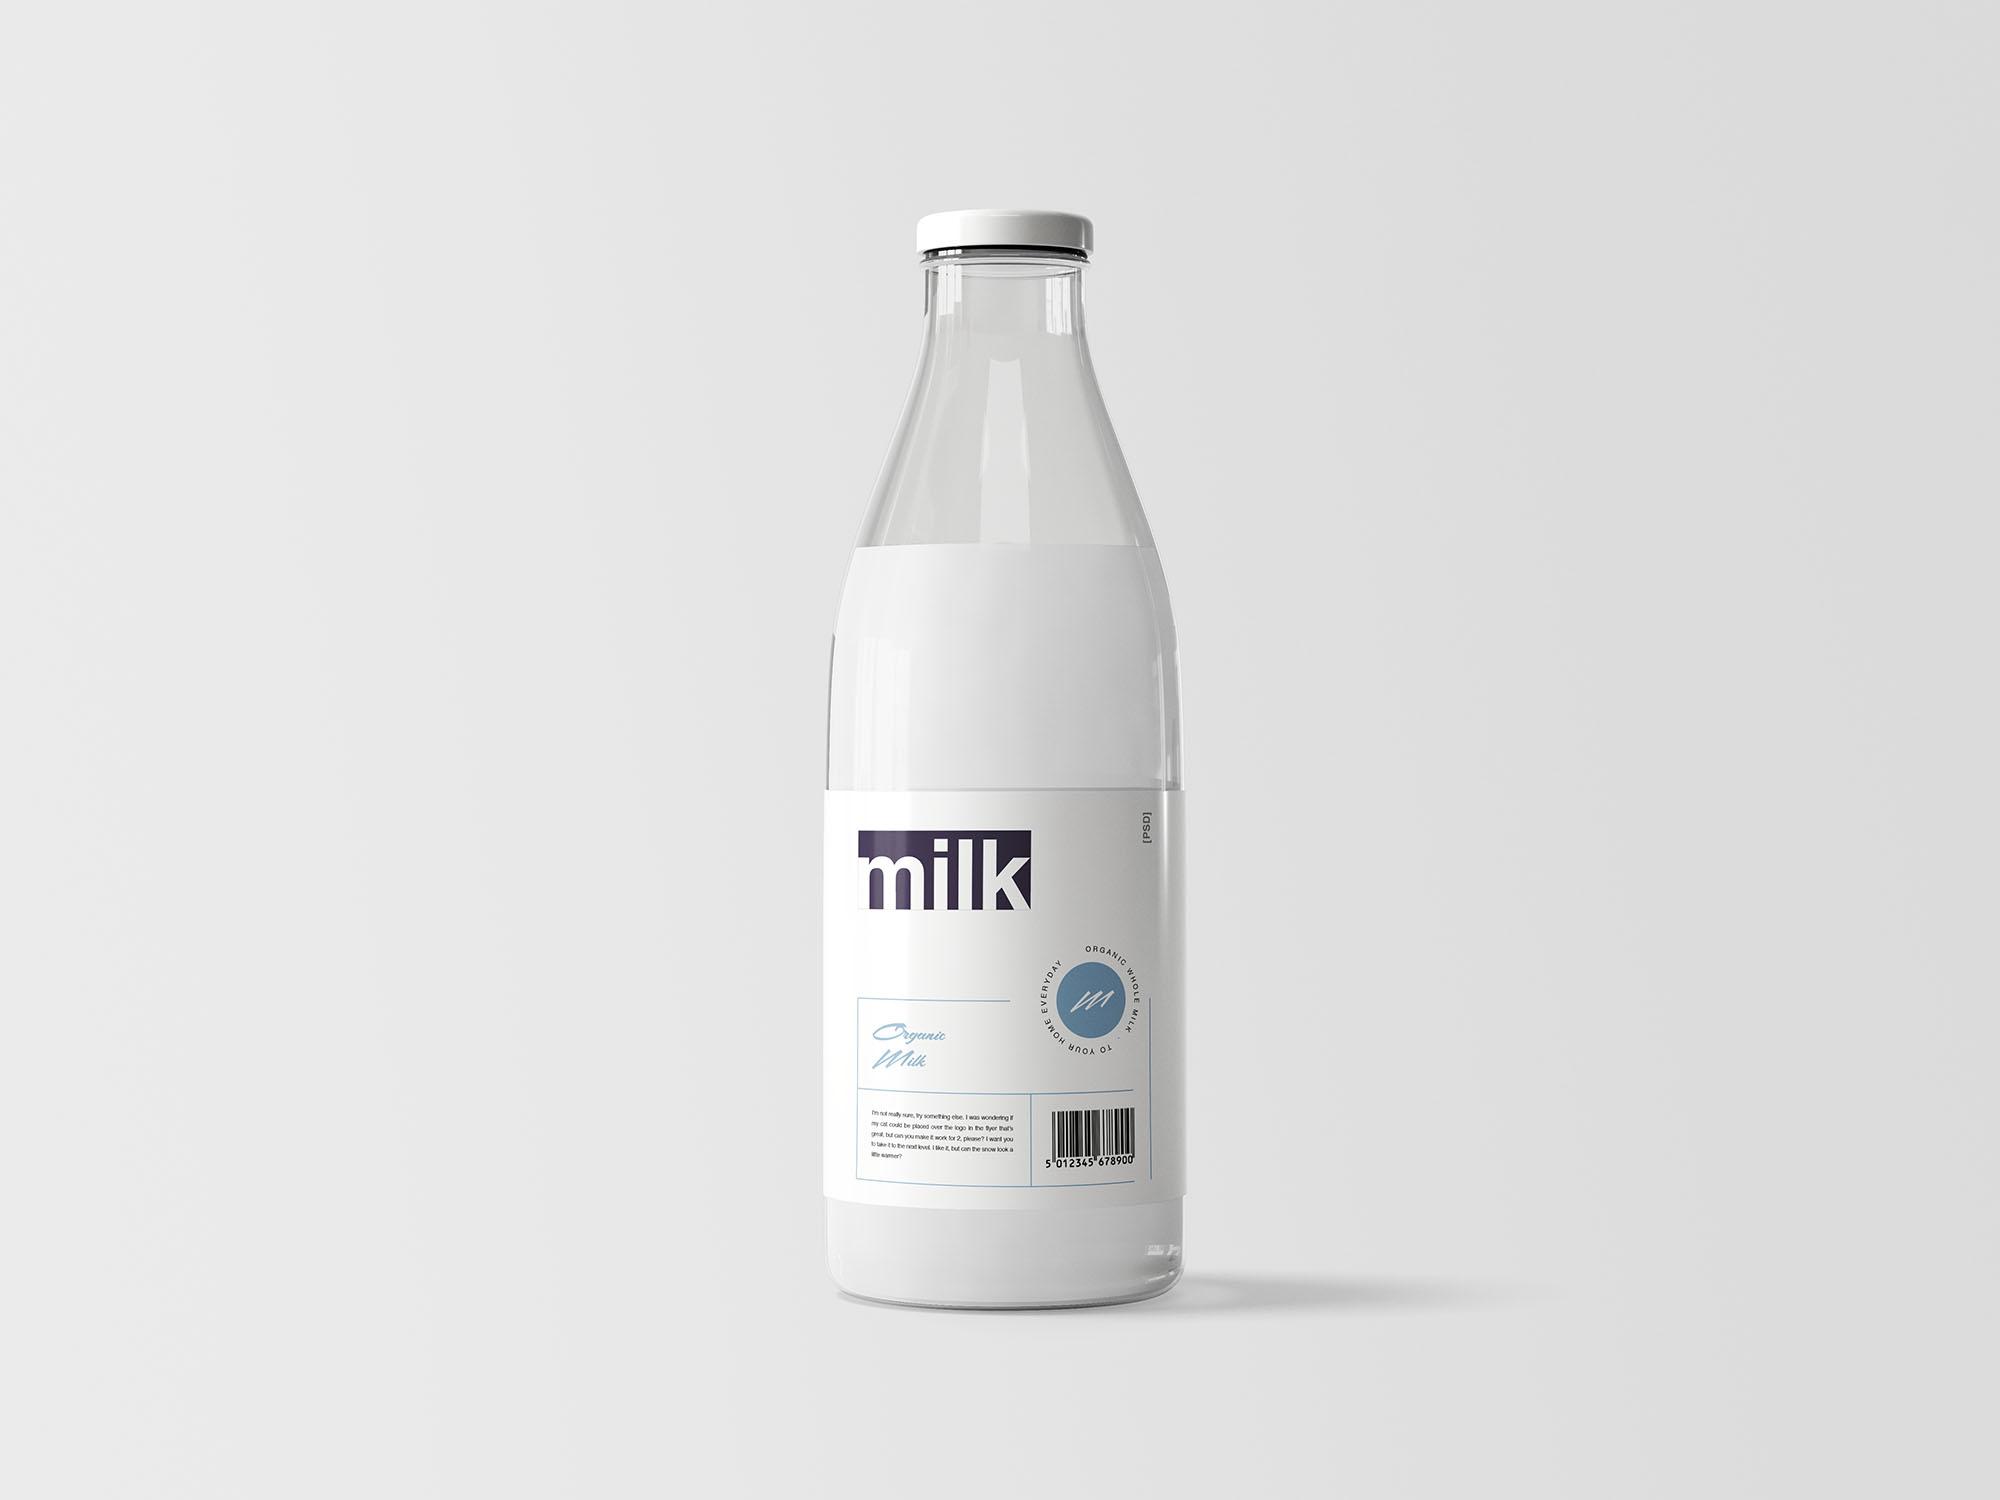 Milk Bottle Mockup